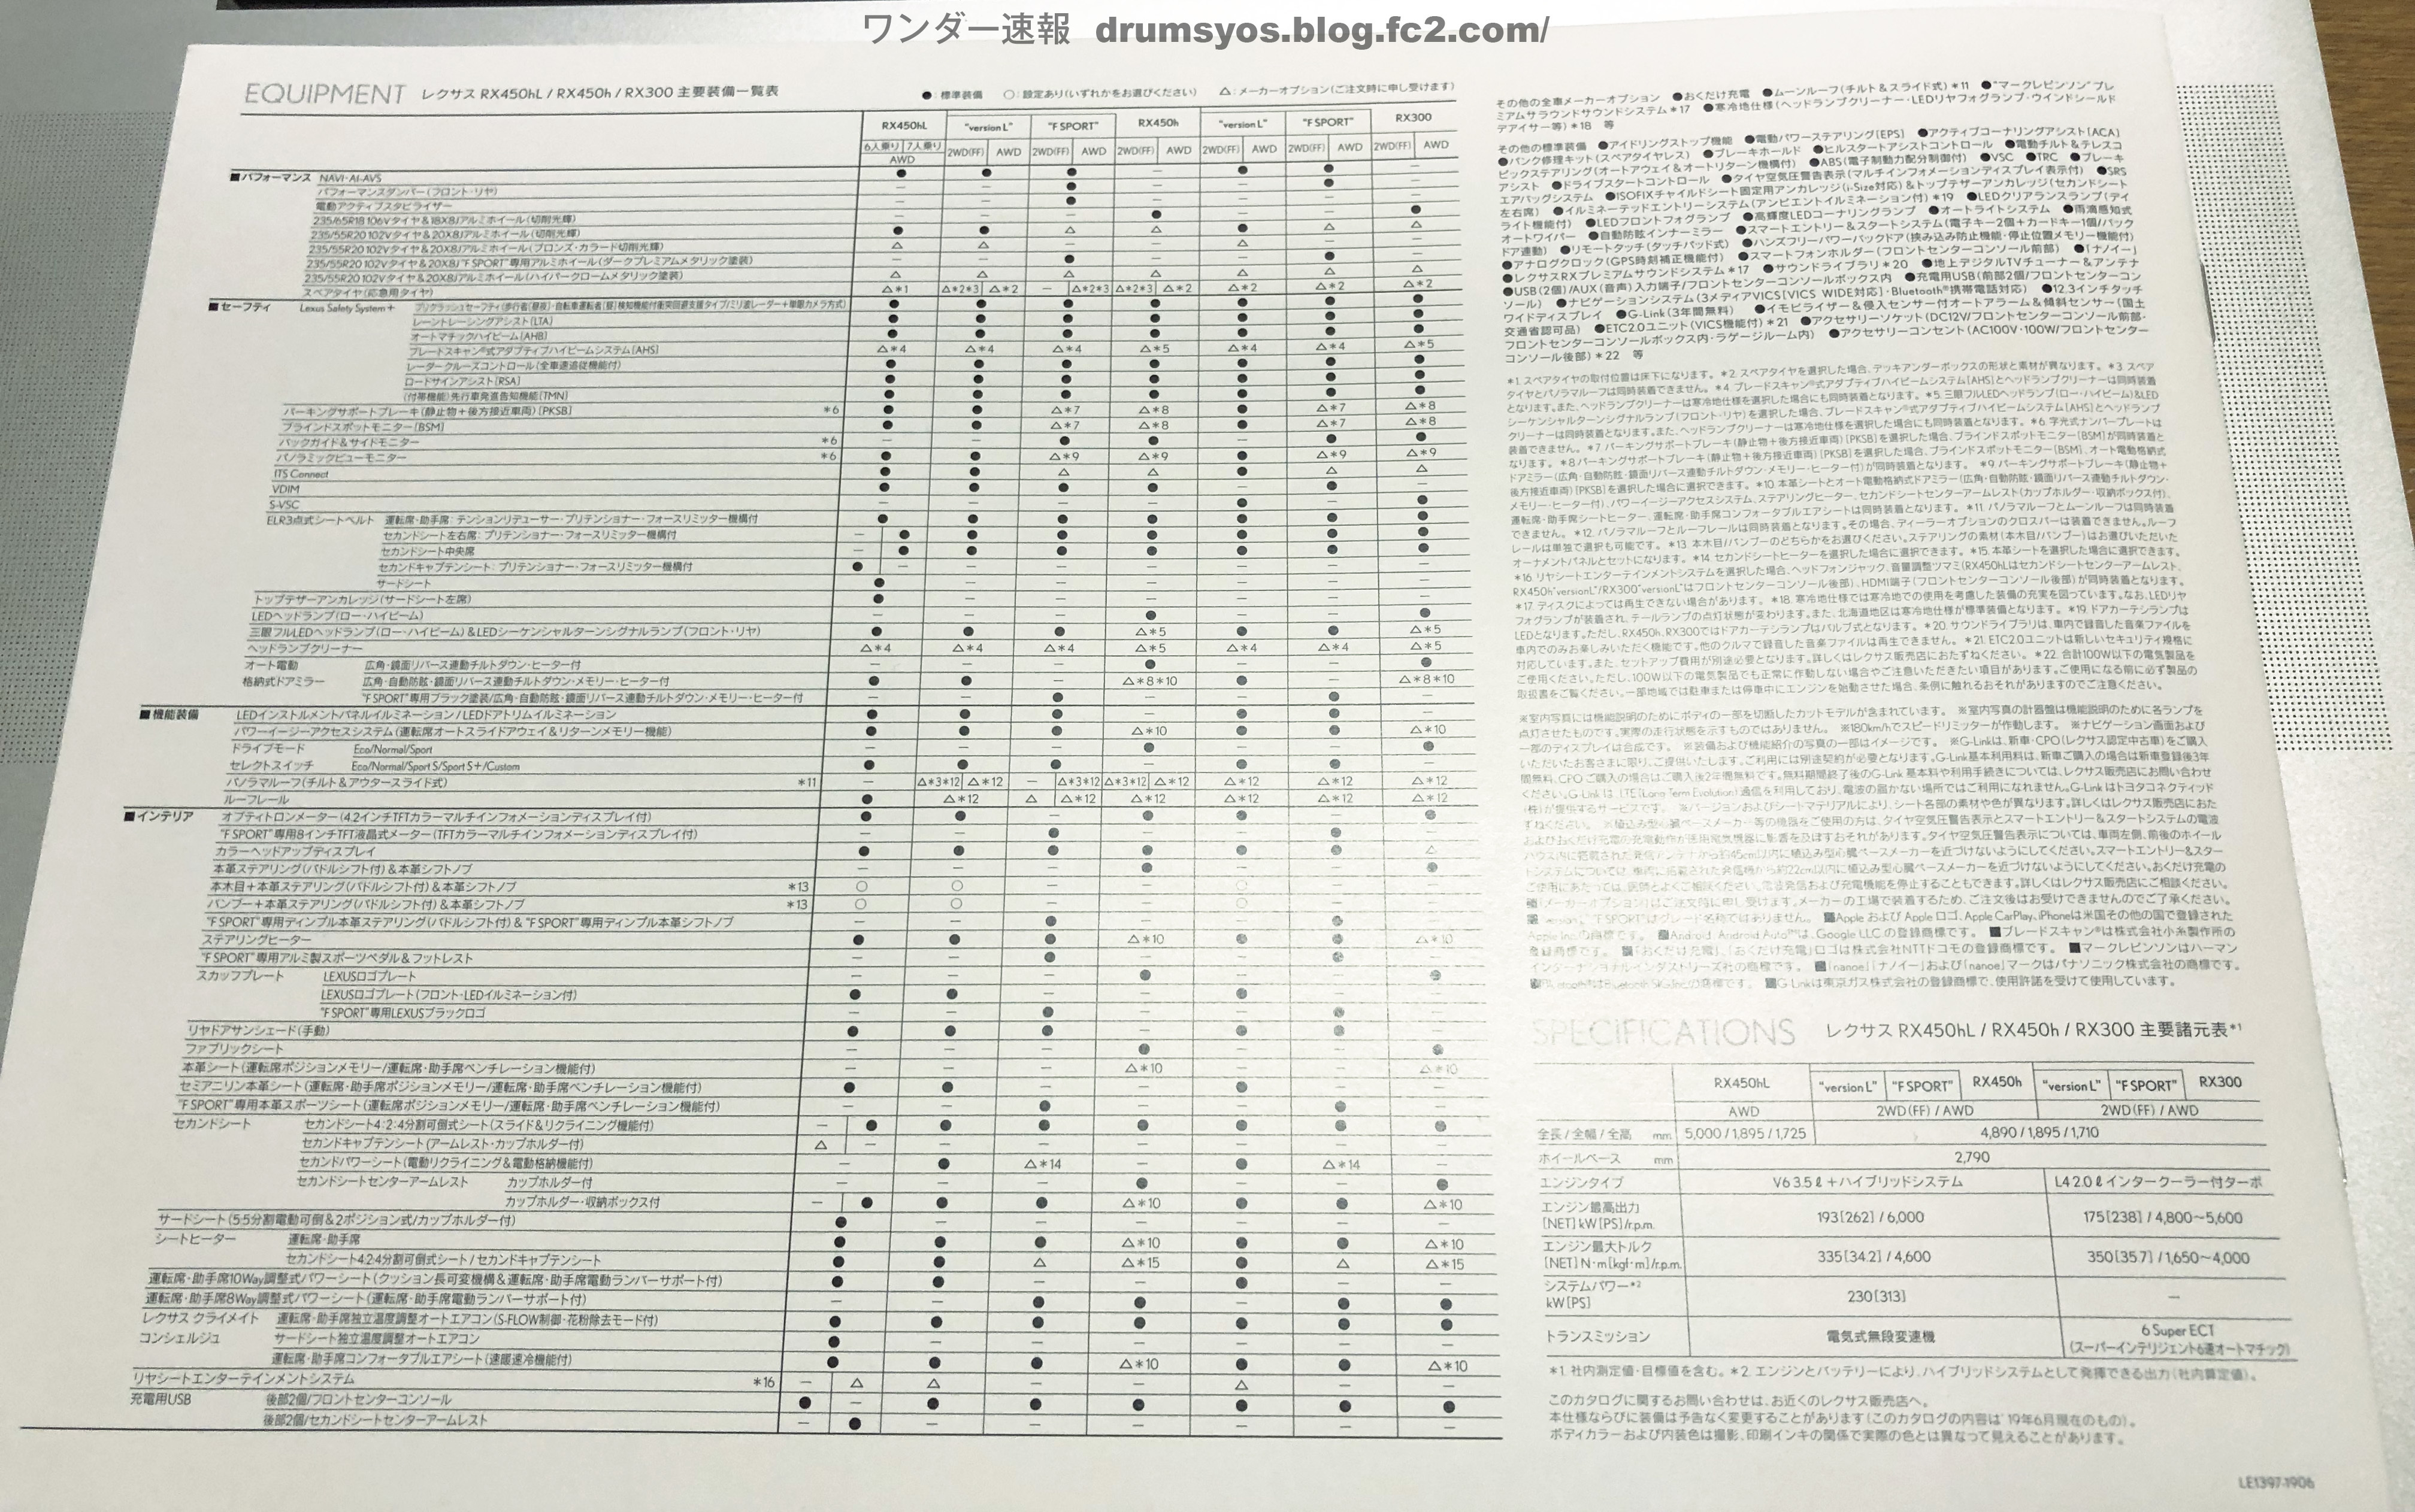 RXcatalog.jpg